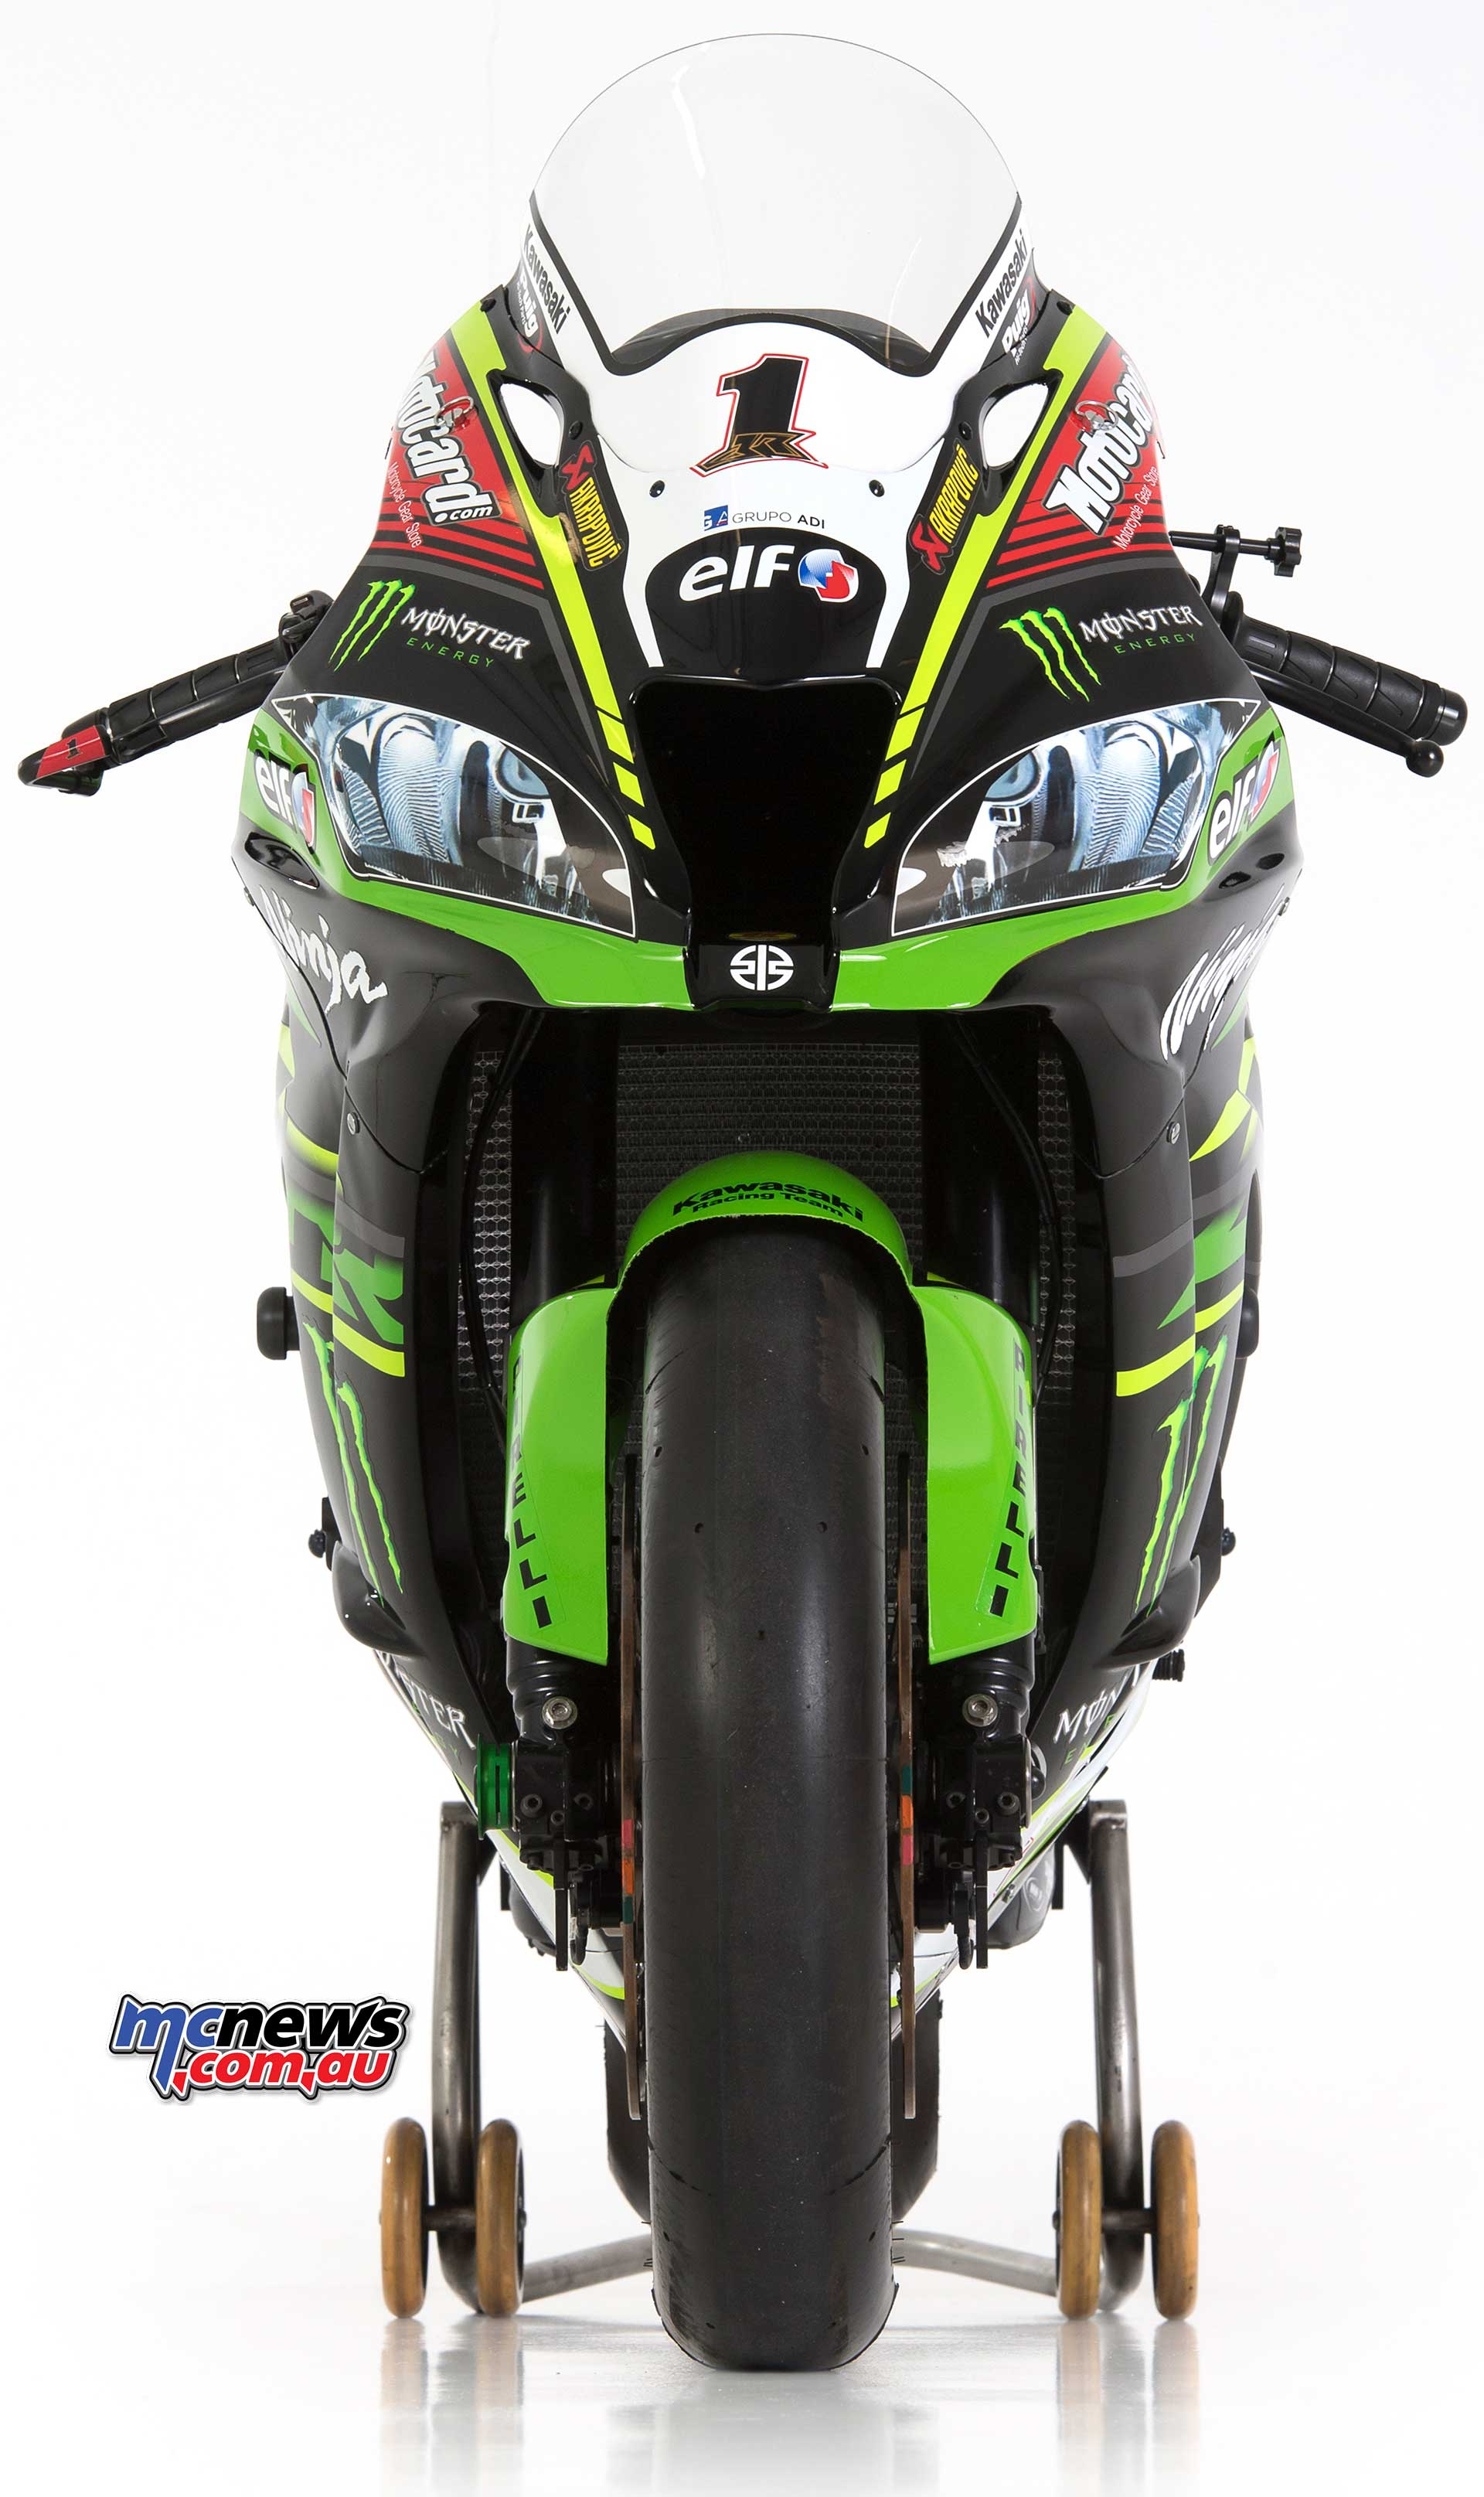 Kawasaki Prepare Wsbk Defence With 1100 Less Rpm Mcnewscomau